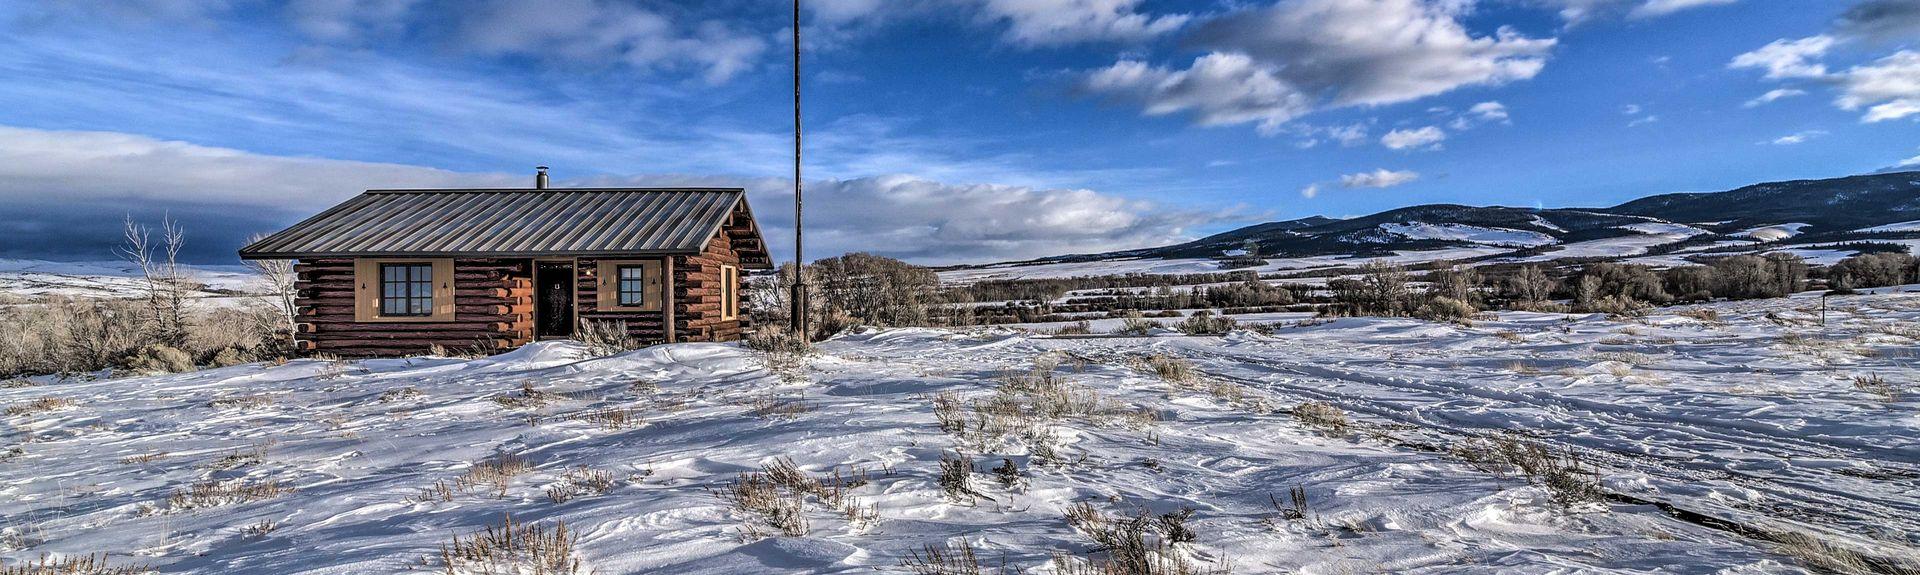 Riverside, Wyoming, United States of America